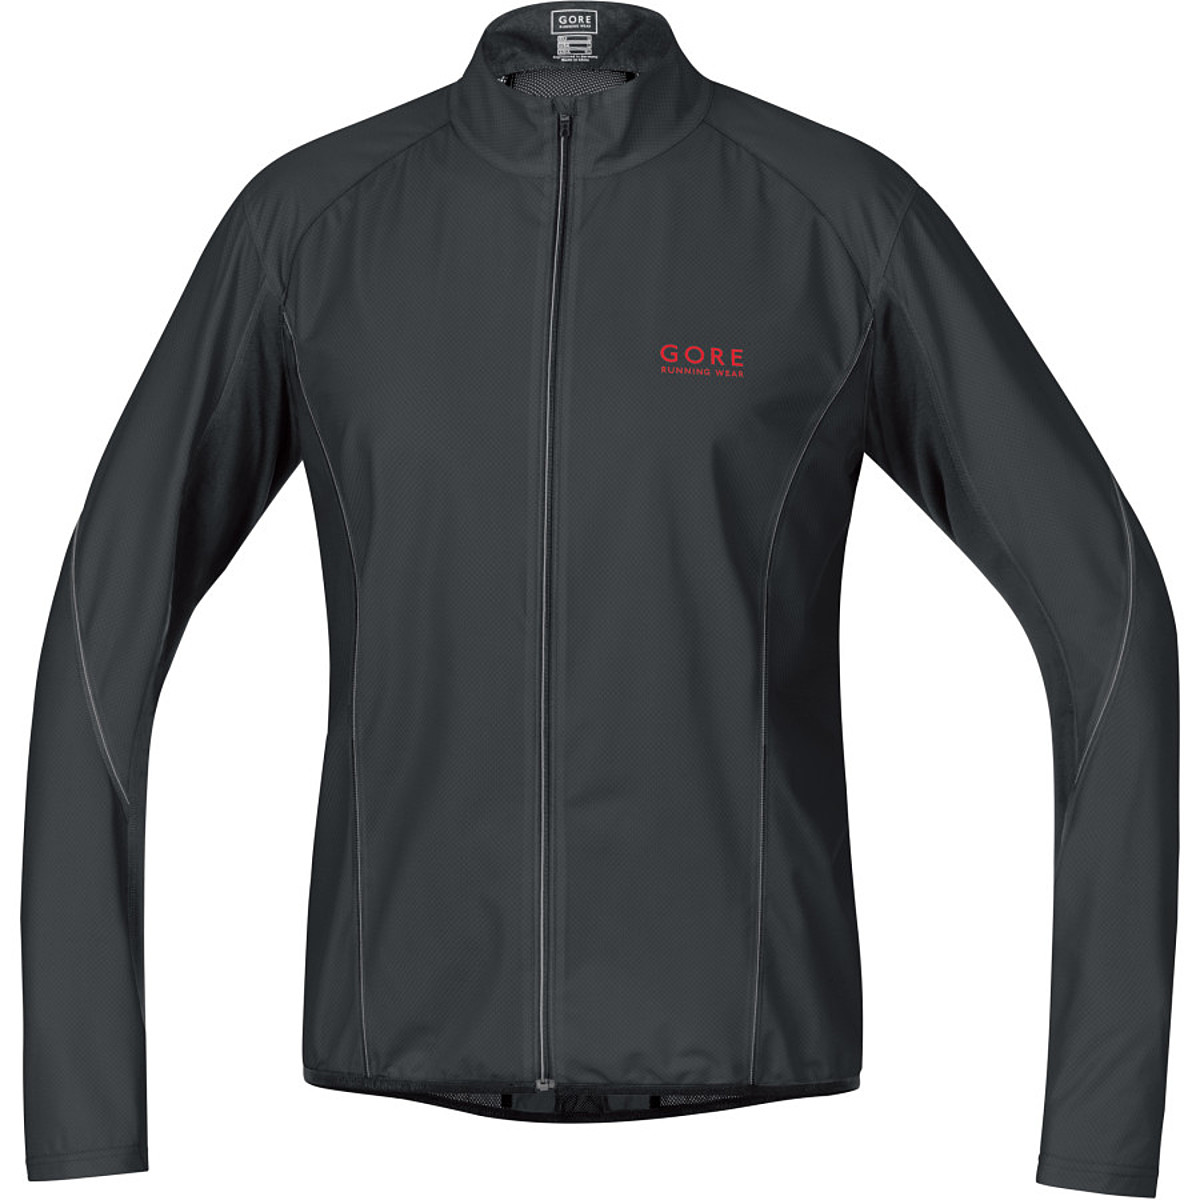 Gore Magnitude AS Jacket